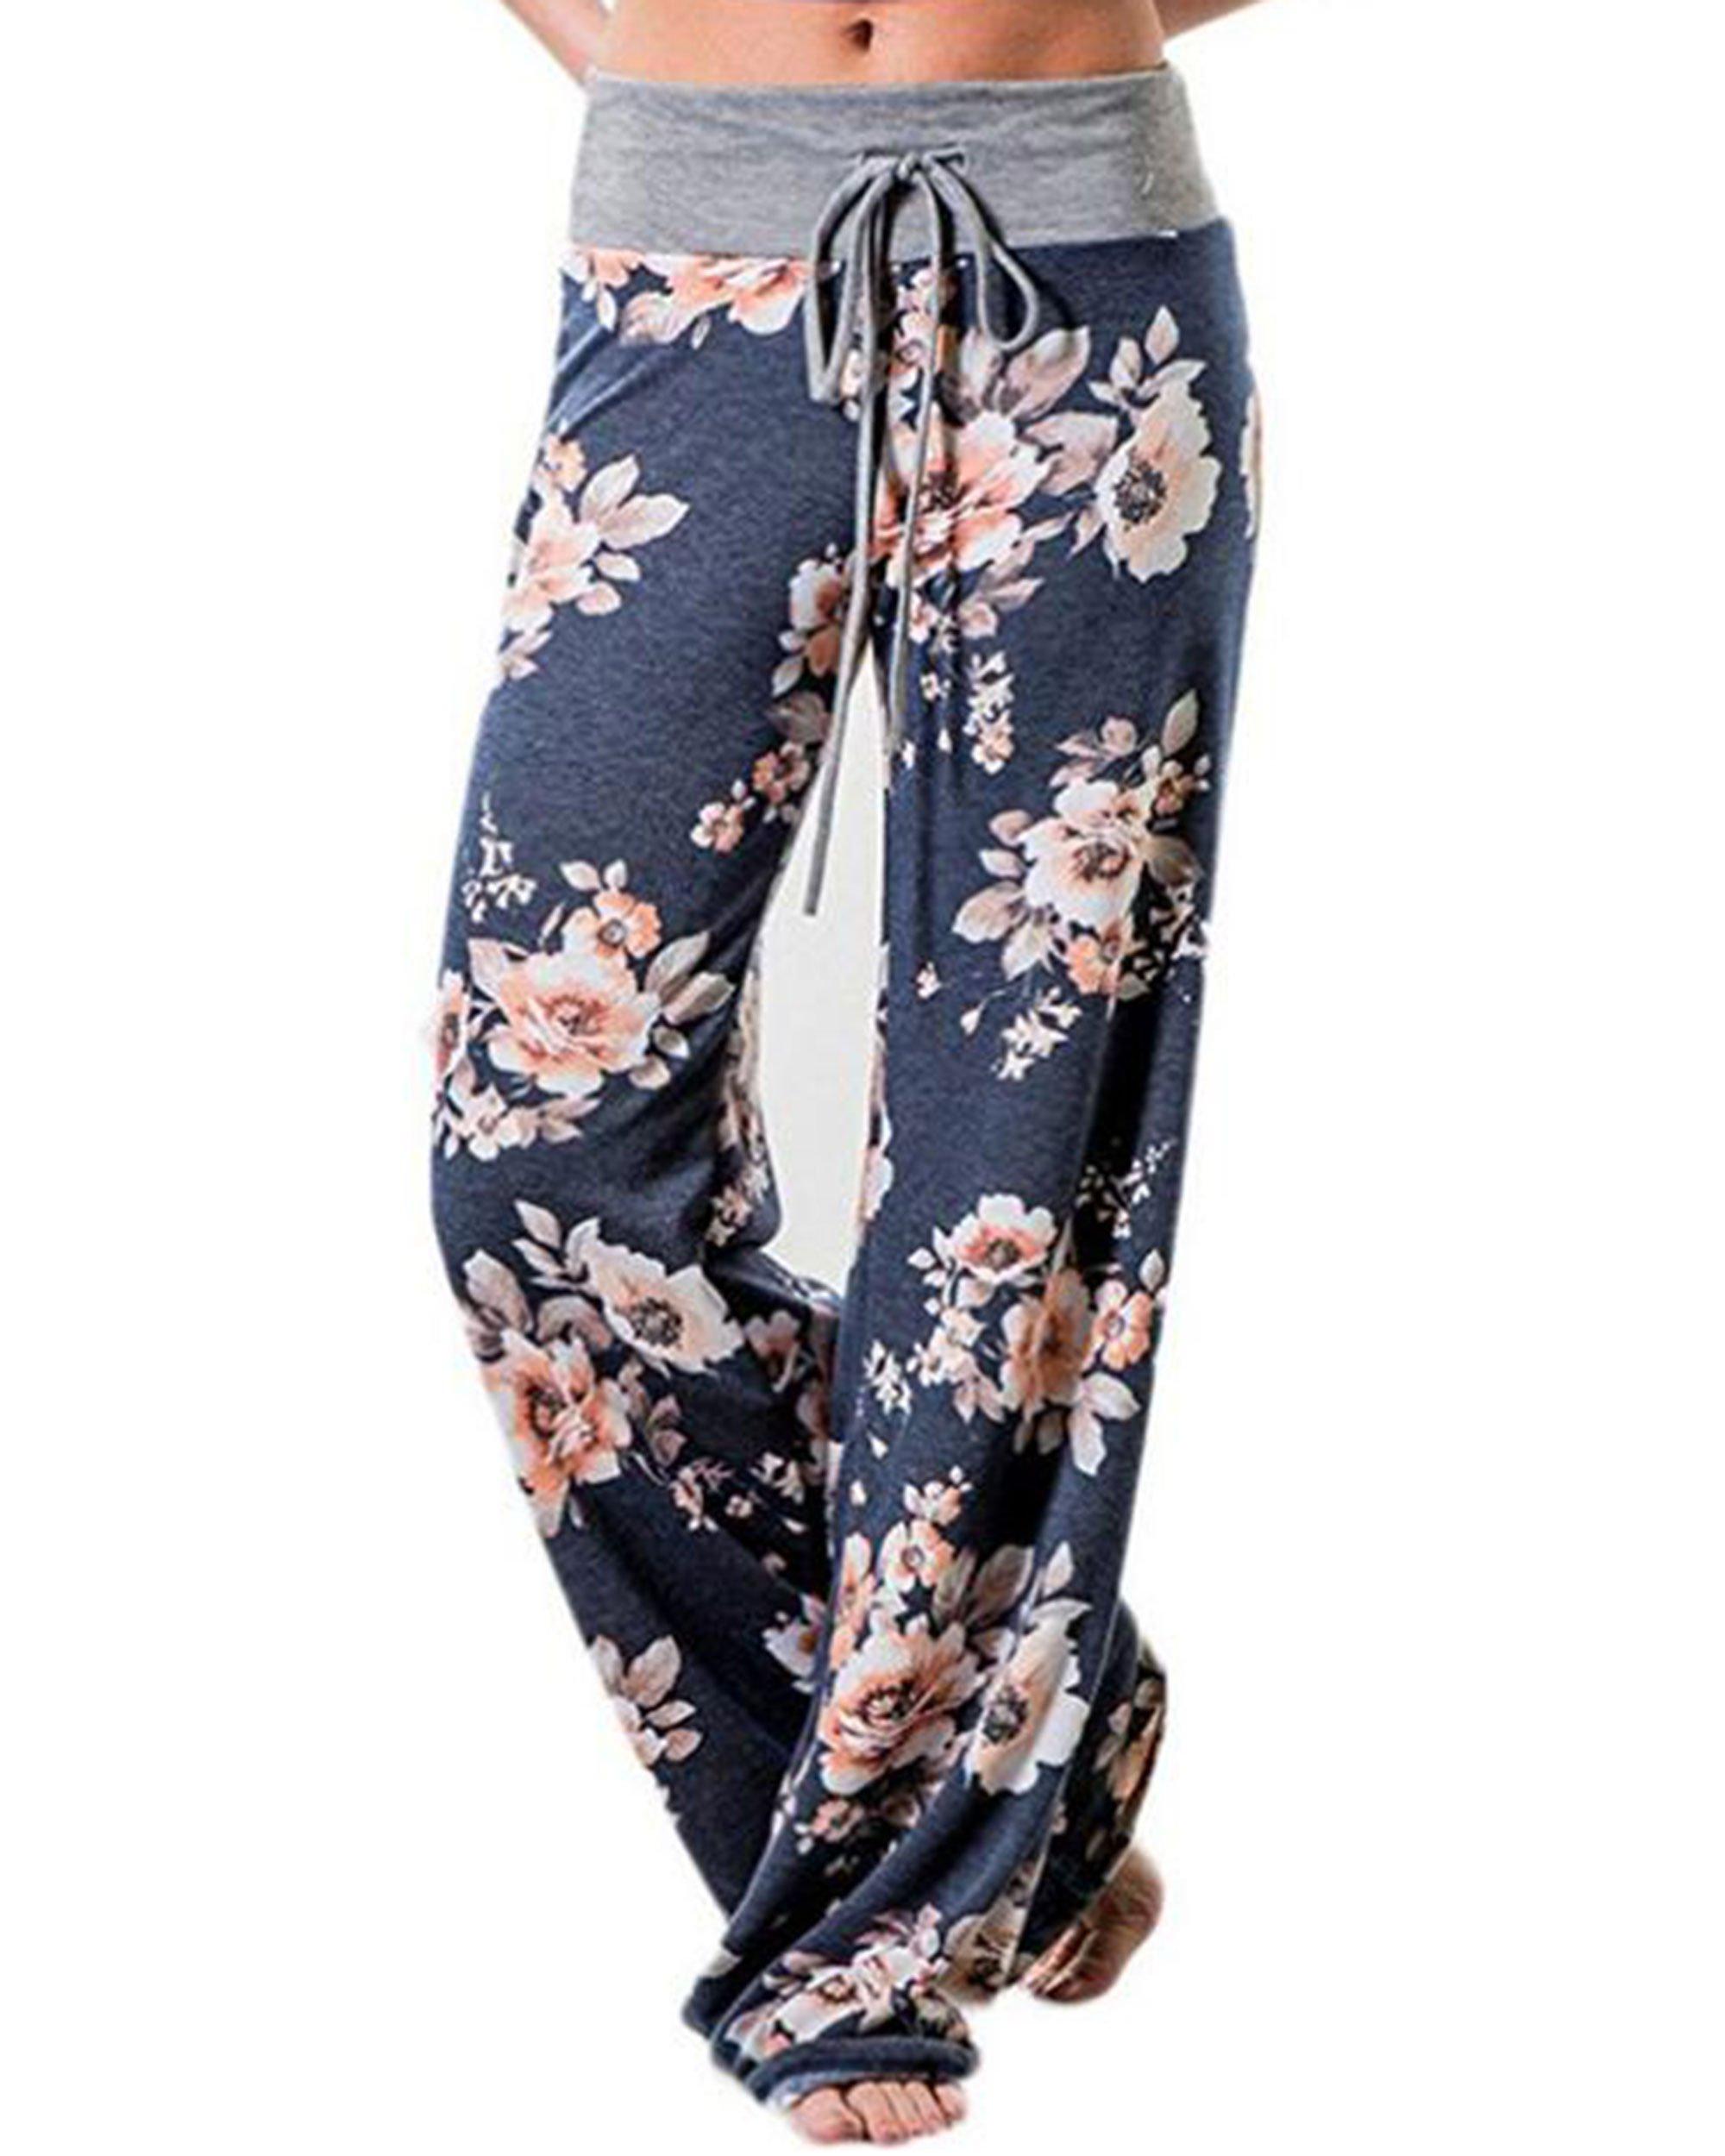 AceIce Women's Comfy Stretch Floral Print Lounge Pants Casual Drawstring Palazzo Pants Wide Leg Pajama Pants (Blue, Tag 3XL= US 14)